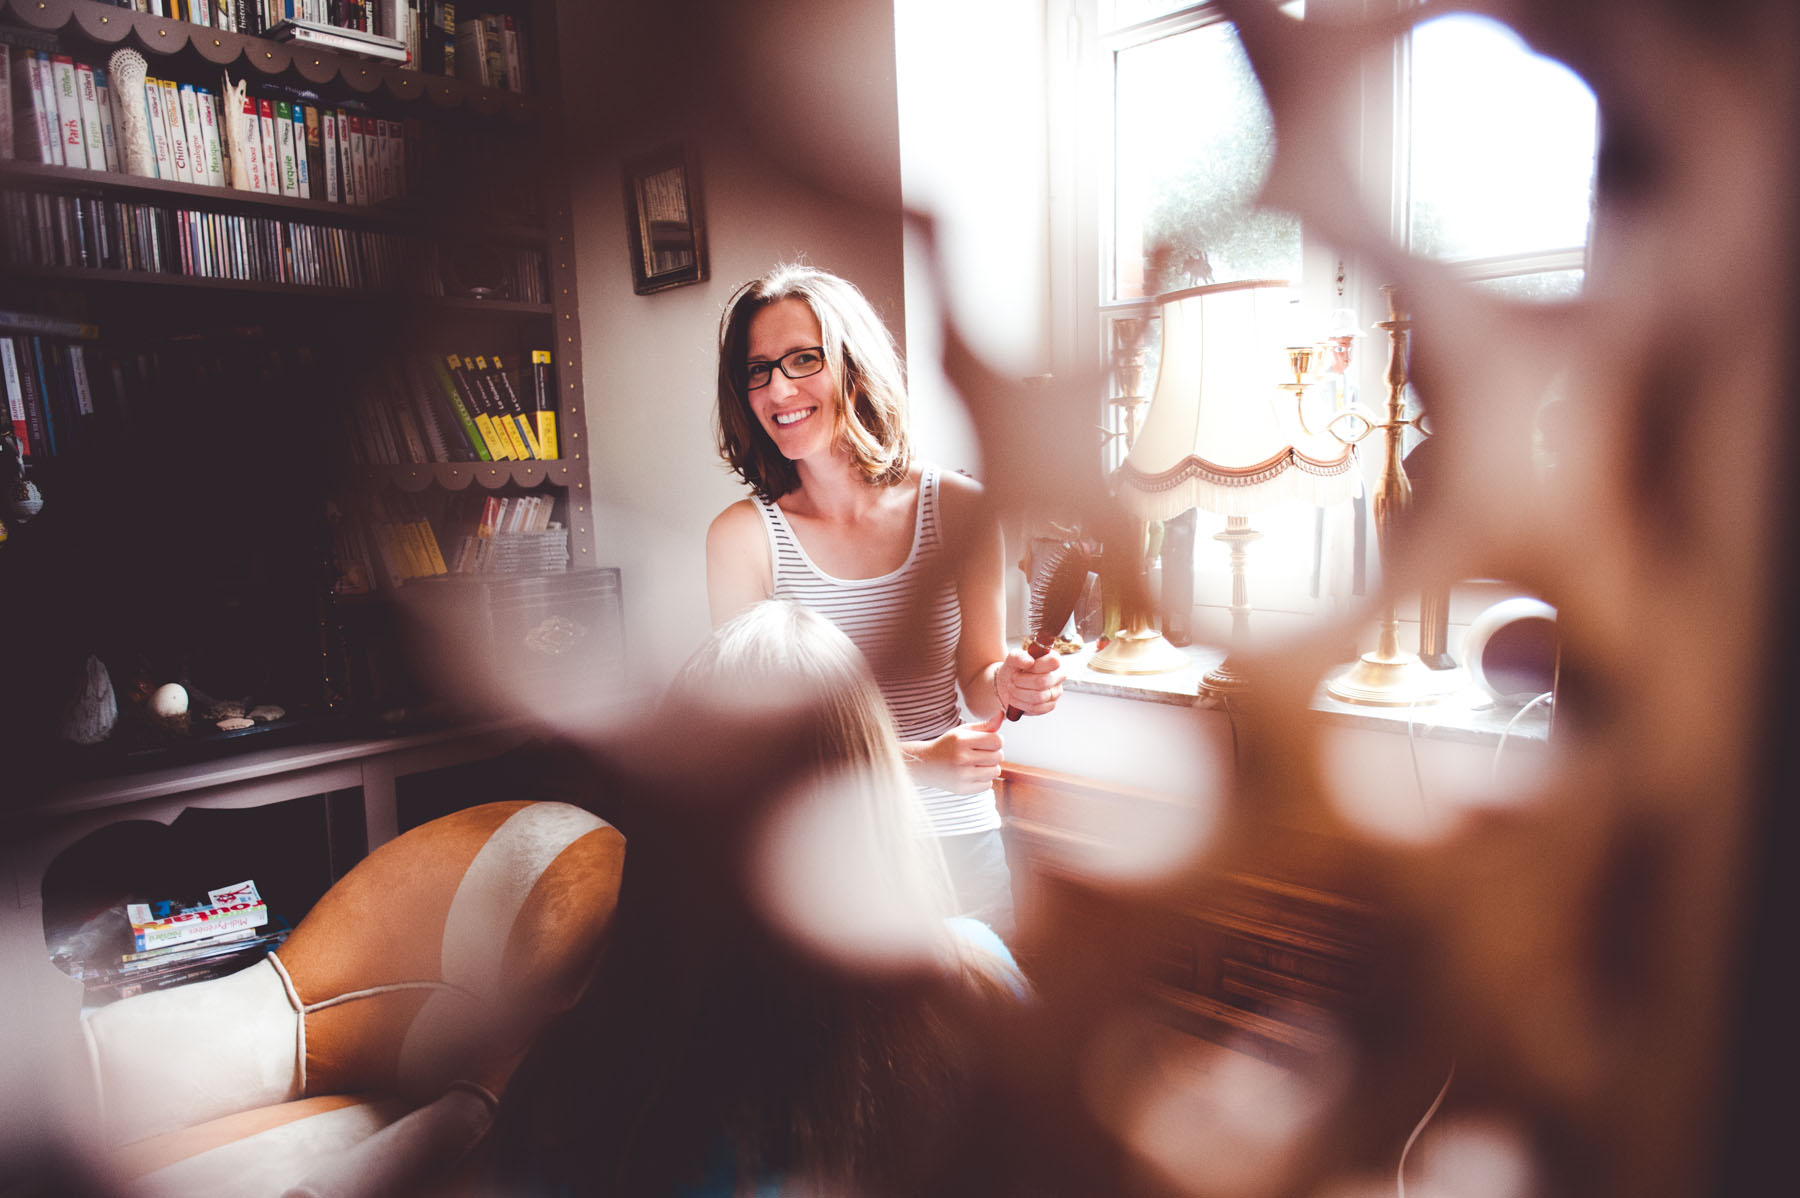 Photographe mariage original toulouse montpellier - M et S - Mademoiselle G Photographie (29)